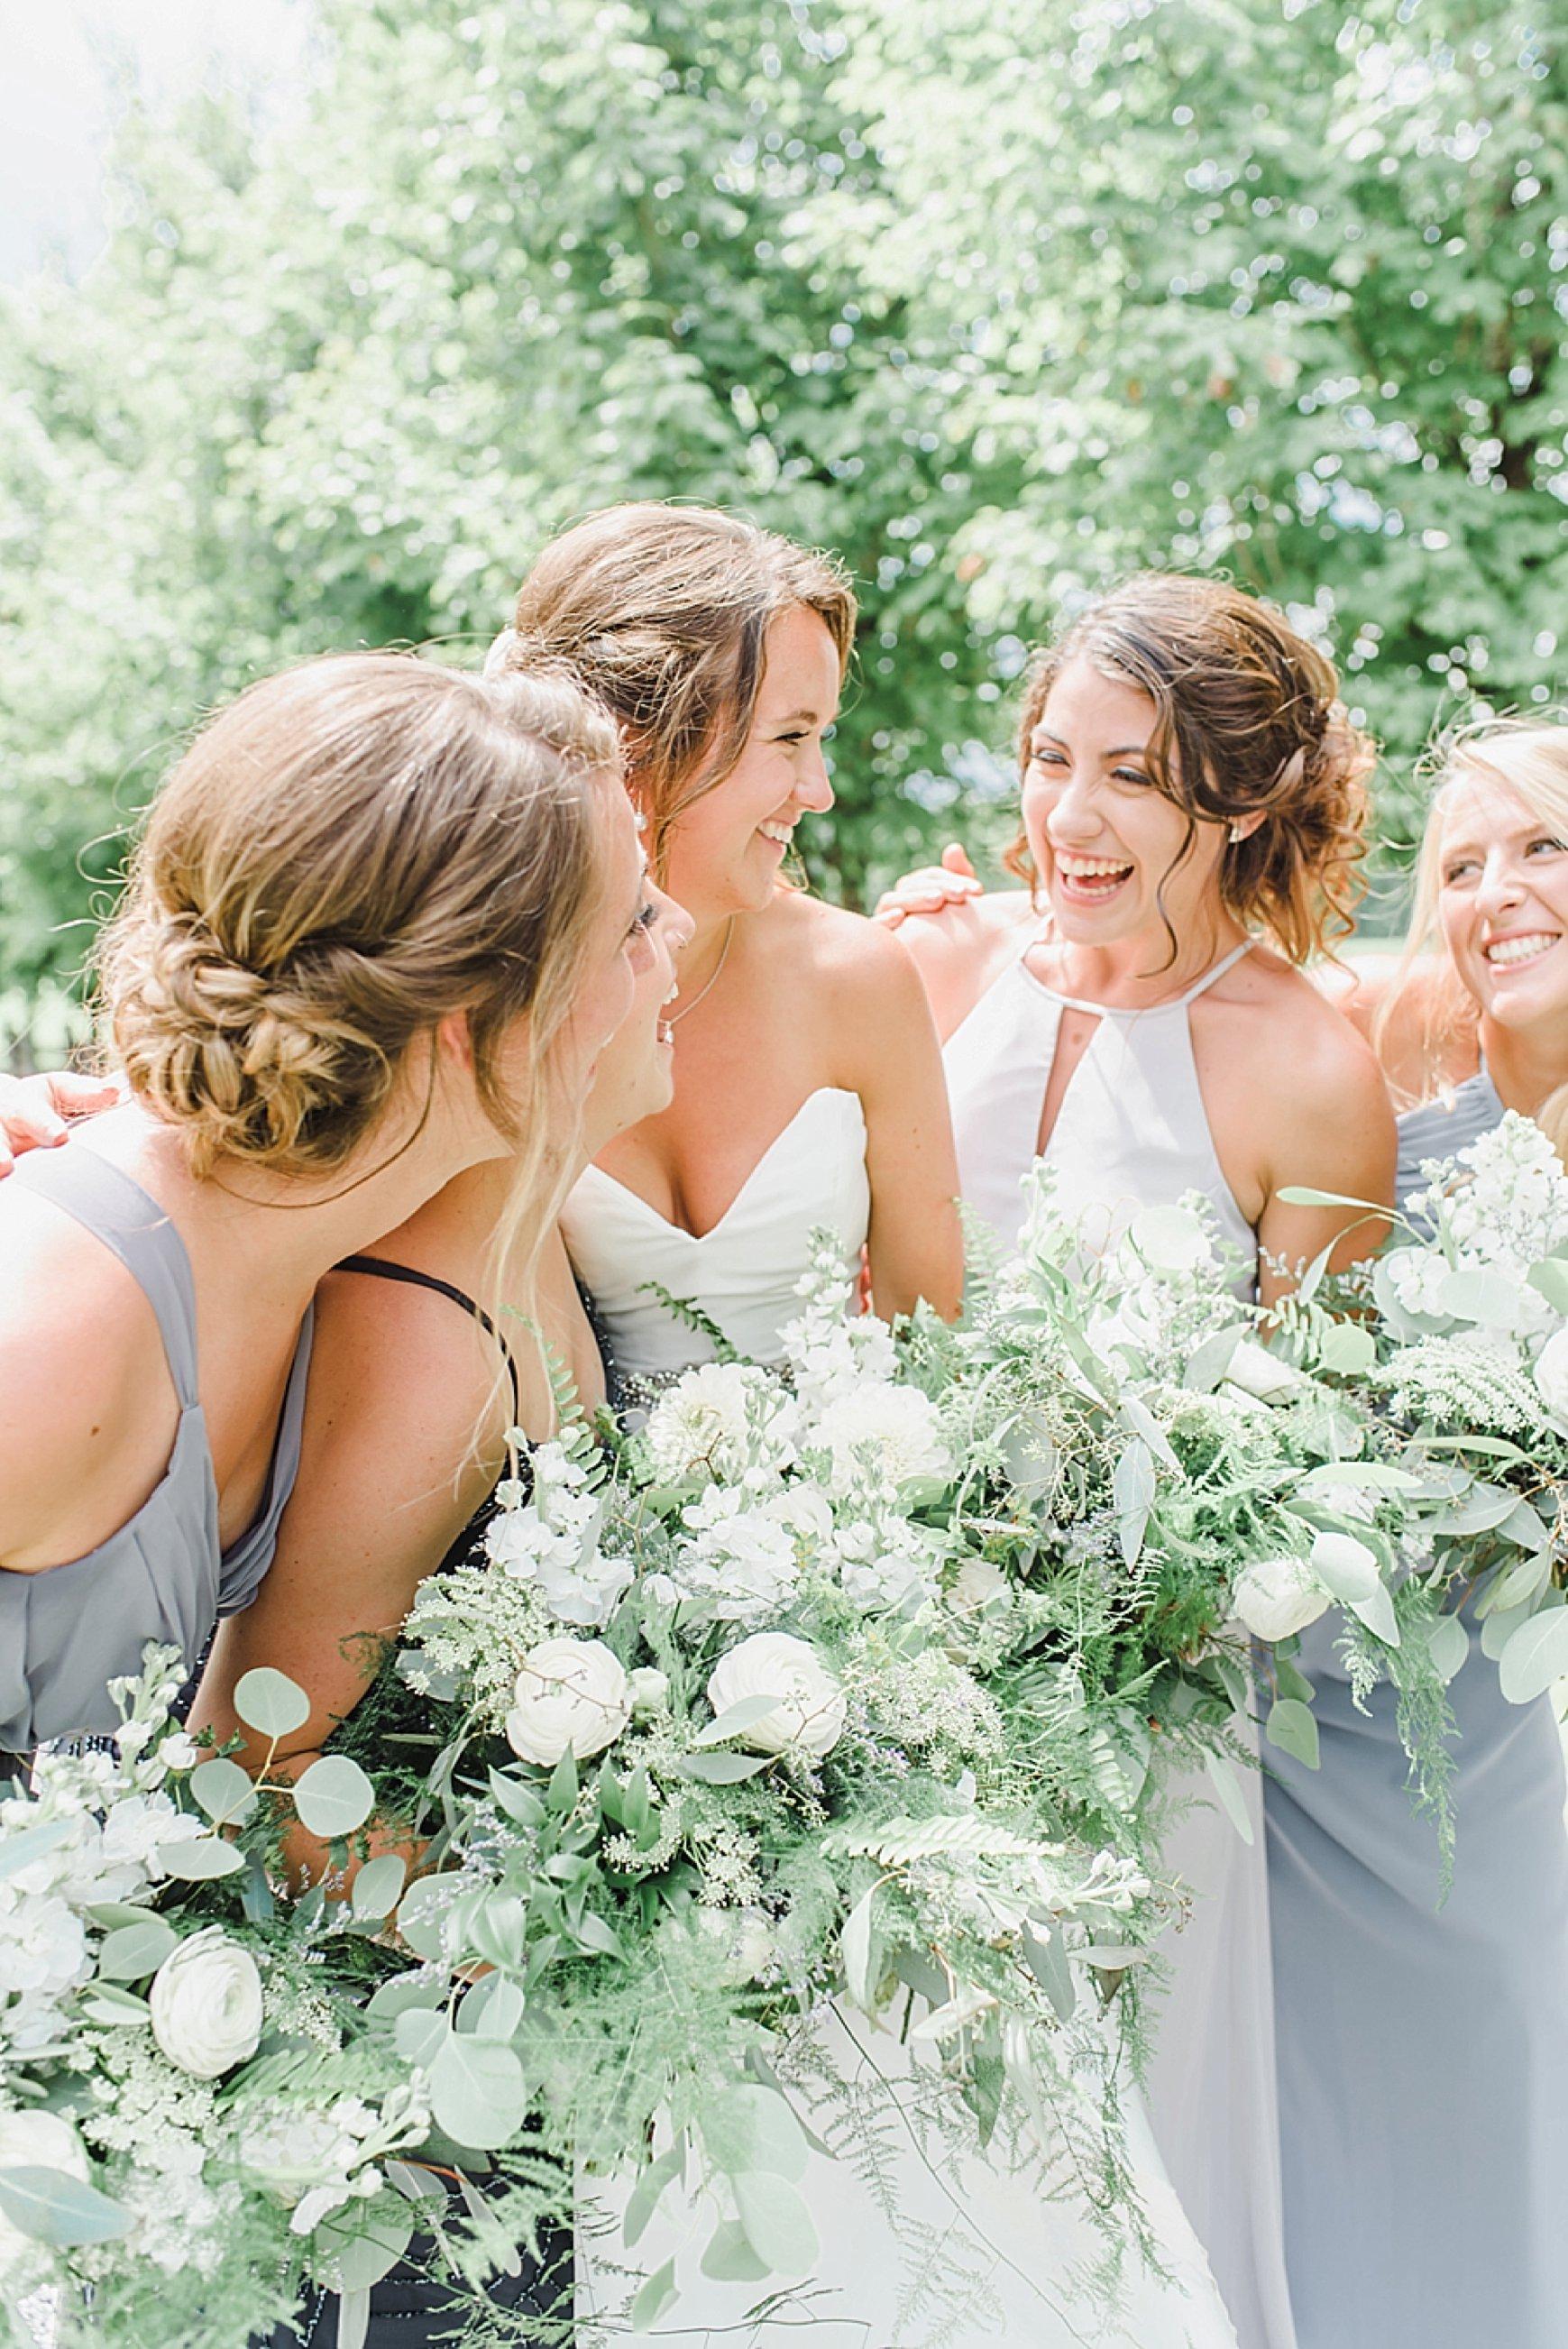 light airy indie fine art ottawa wedding photographer | Ali and Batoul Photography_0521.jpg